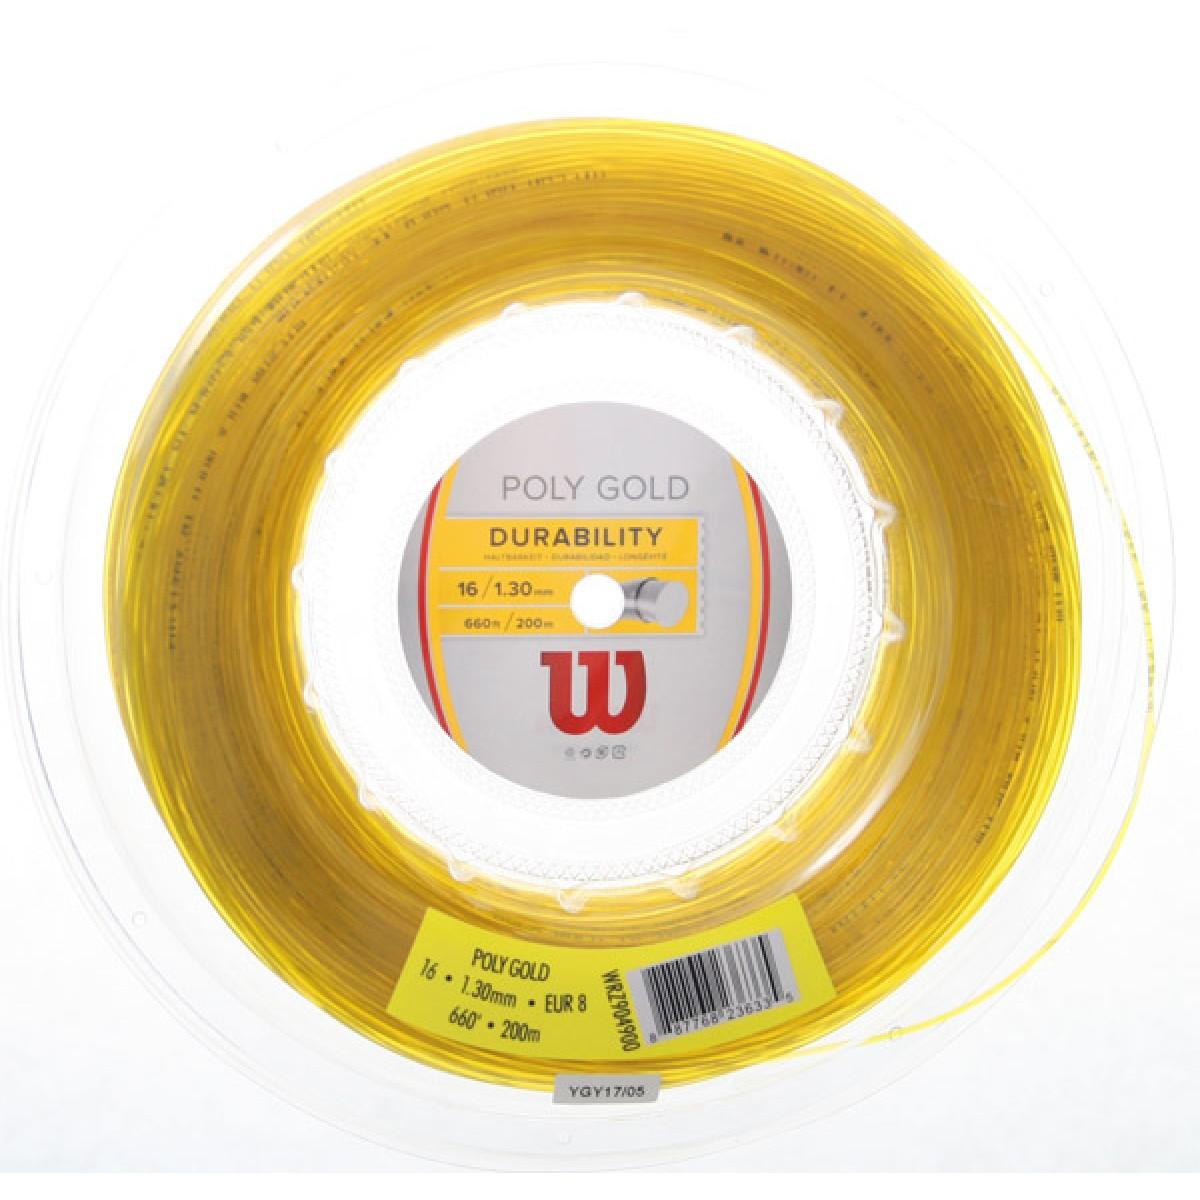 BOBINE WILSON POLY GOLD (200 METRES)